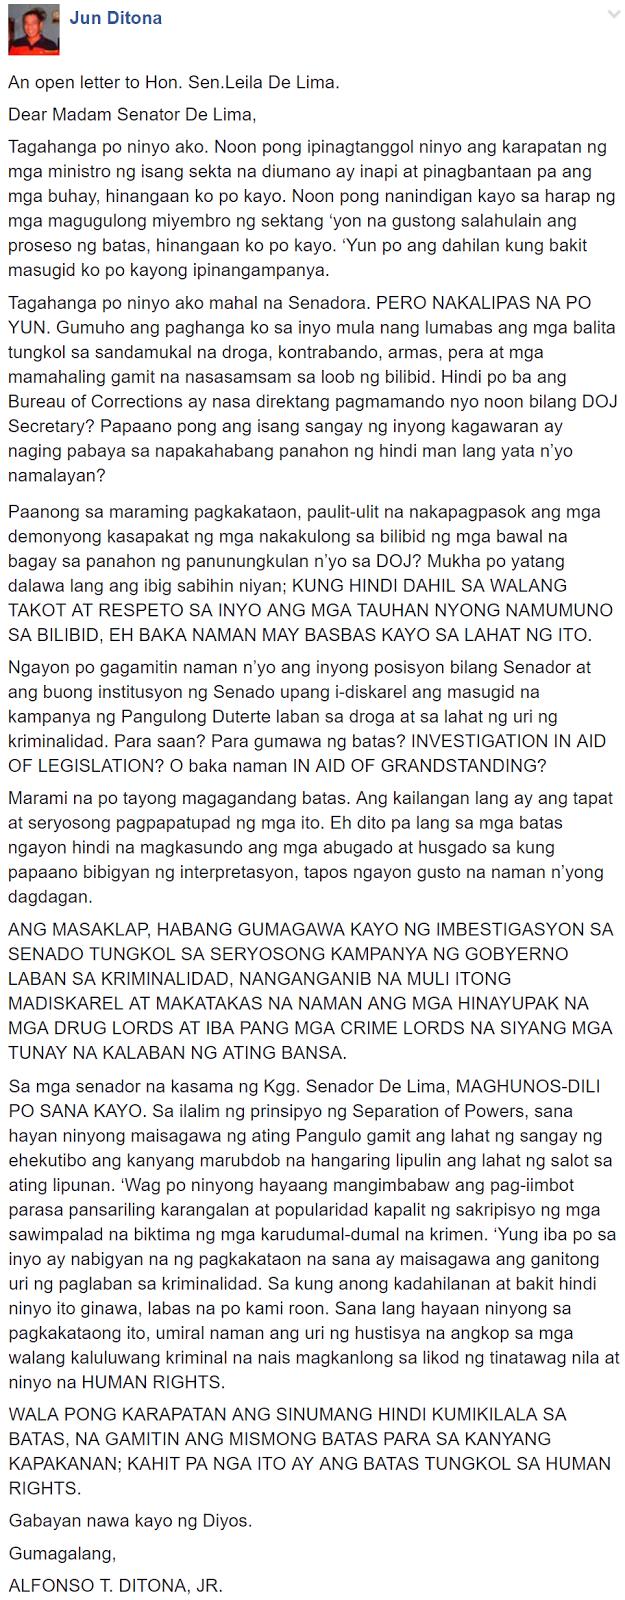 A philosopher's powerful open letter to De Lima: Gumuho ang paghanga ko sa inyo senadora